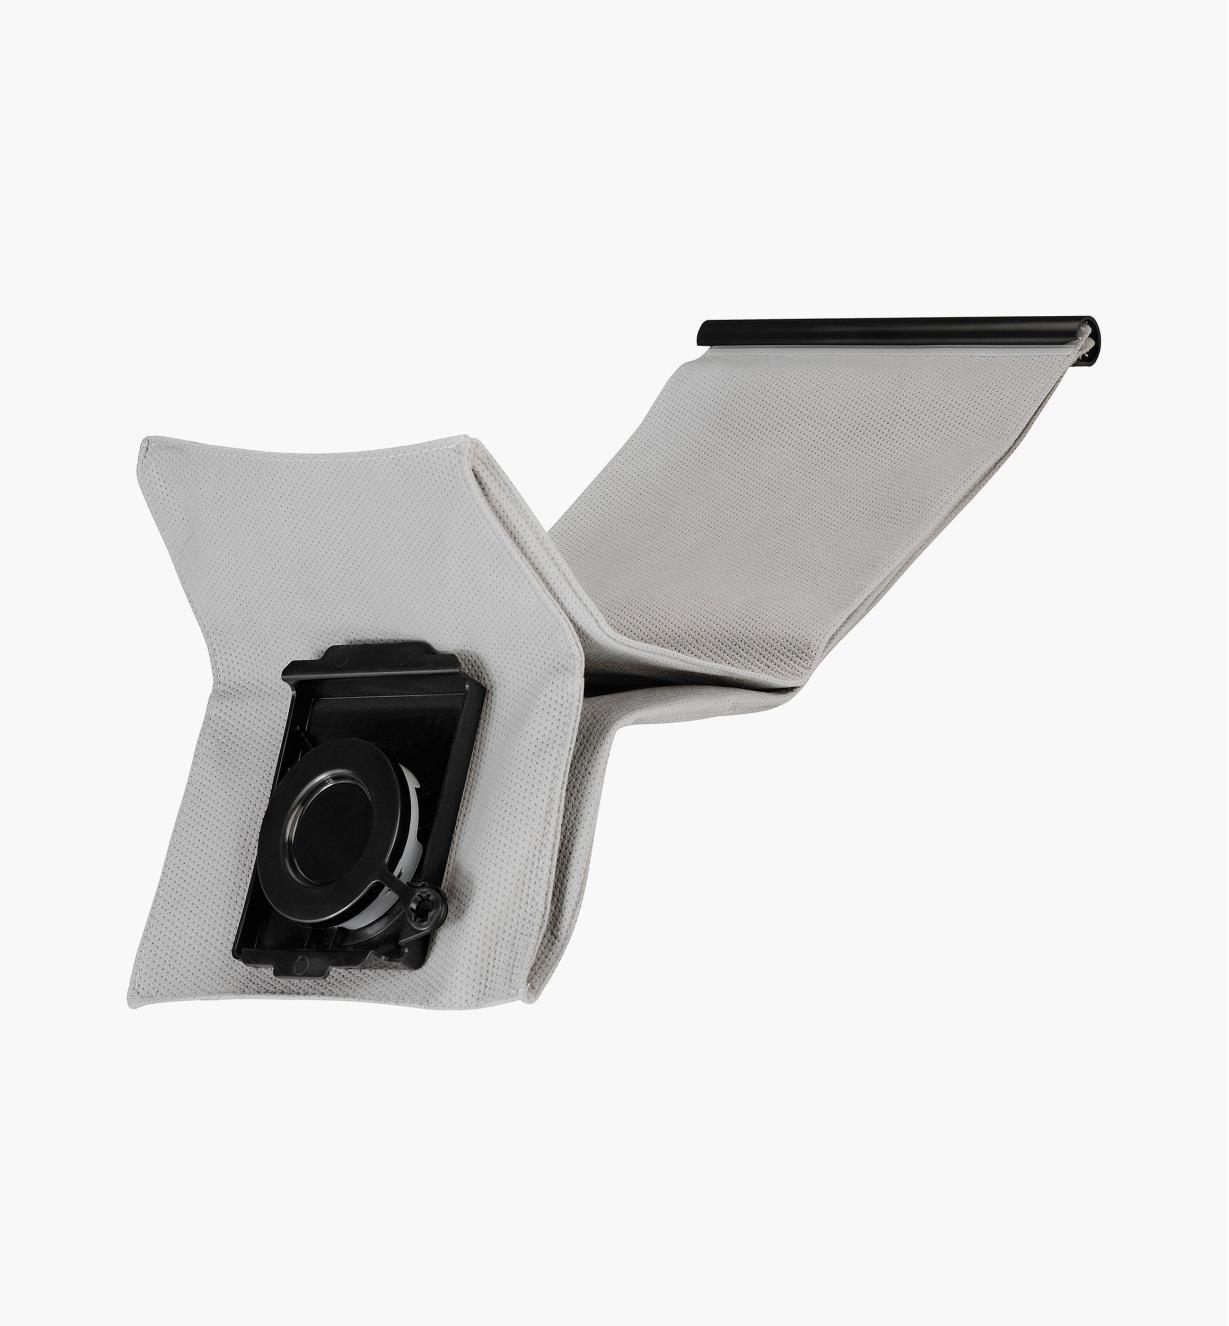 ZA496120 - Longlife Filter Bags (CT 26 E)